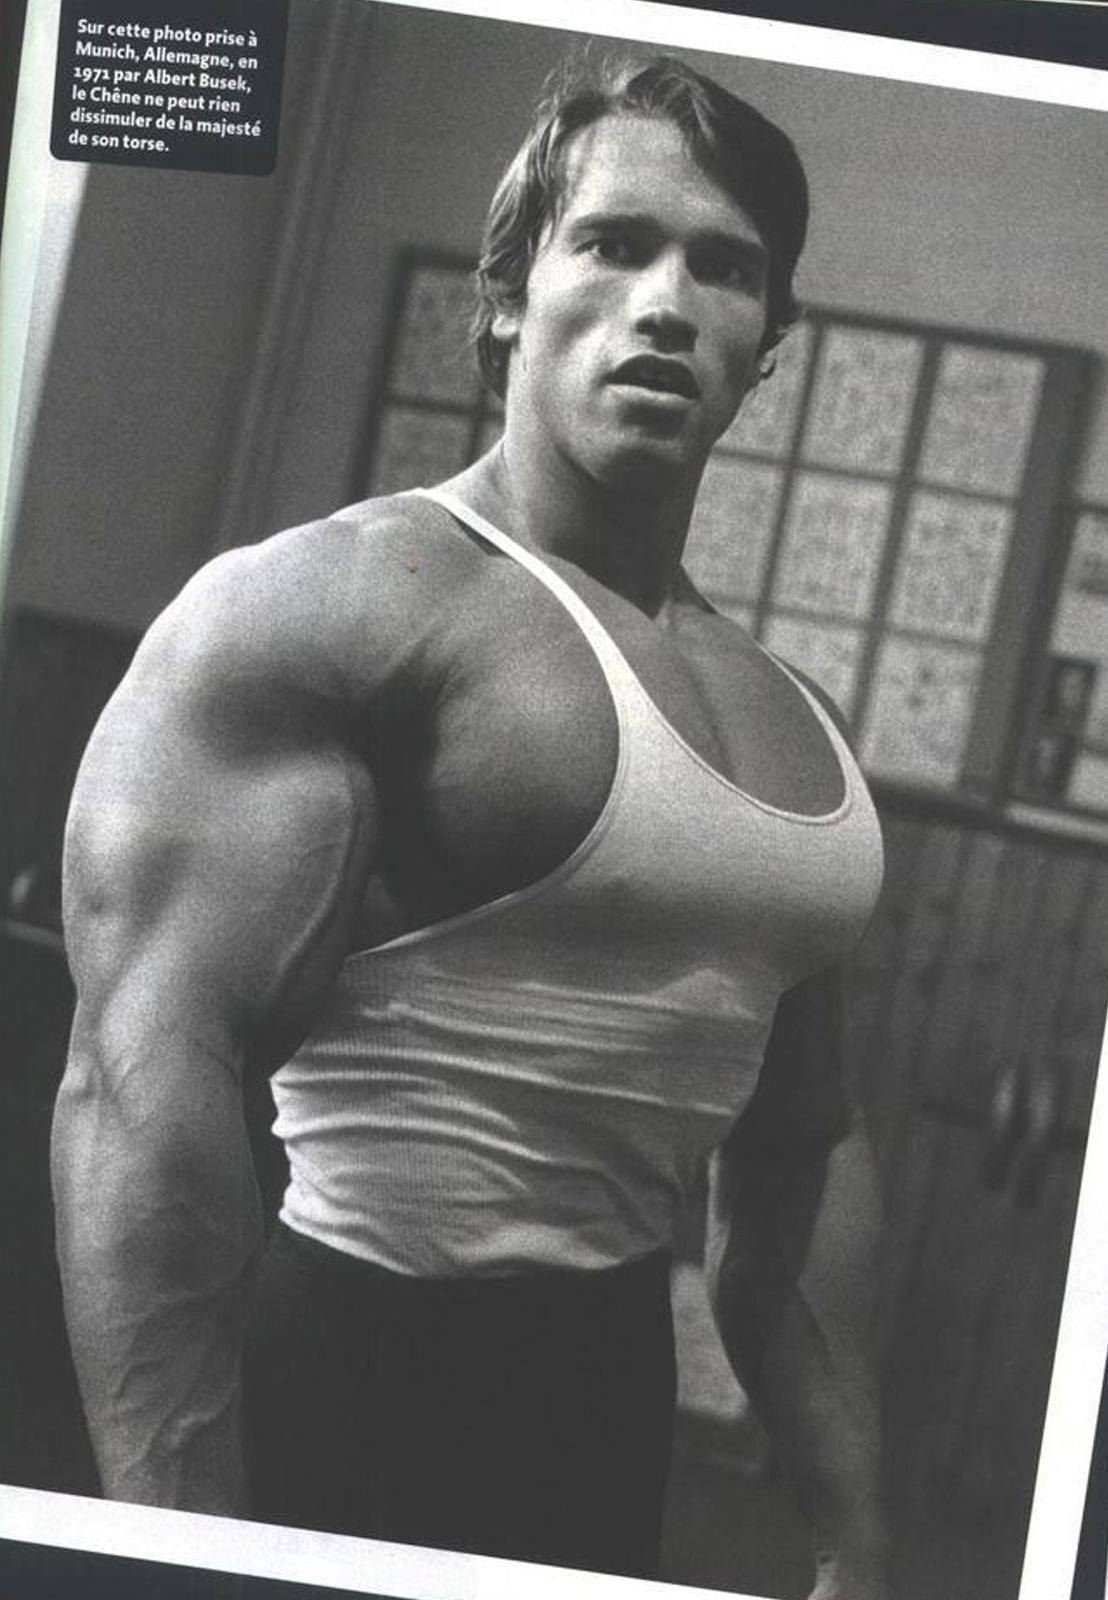 http://3.bp.blogspot.com/-9d1NtsH9Ruw/TkhLb1dCLxI/AAAAAAAAAZg/cCgE-zEBpbE/s1600/Arnold+Schwarzenegger+Bodybuilding+Wallpaper-29.png